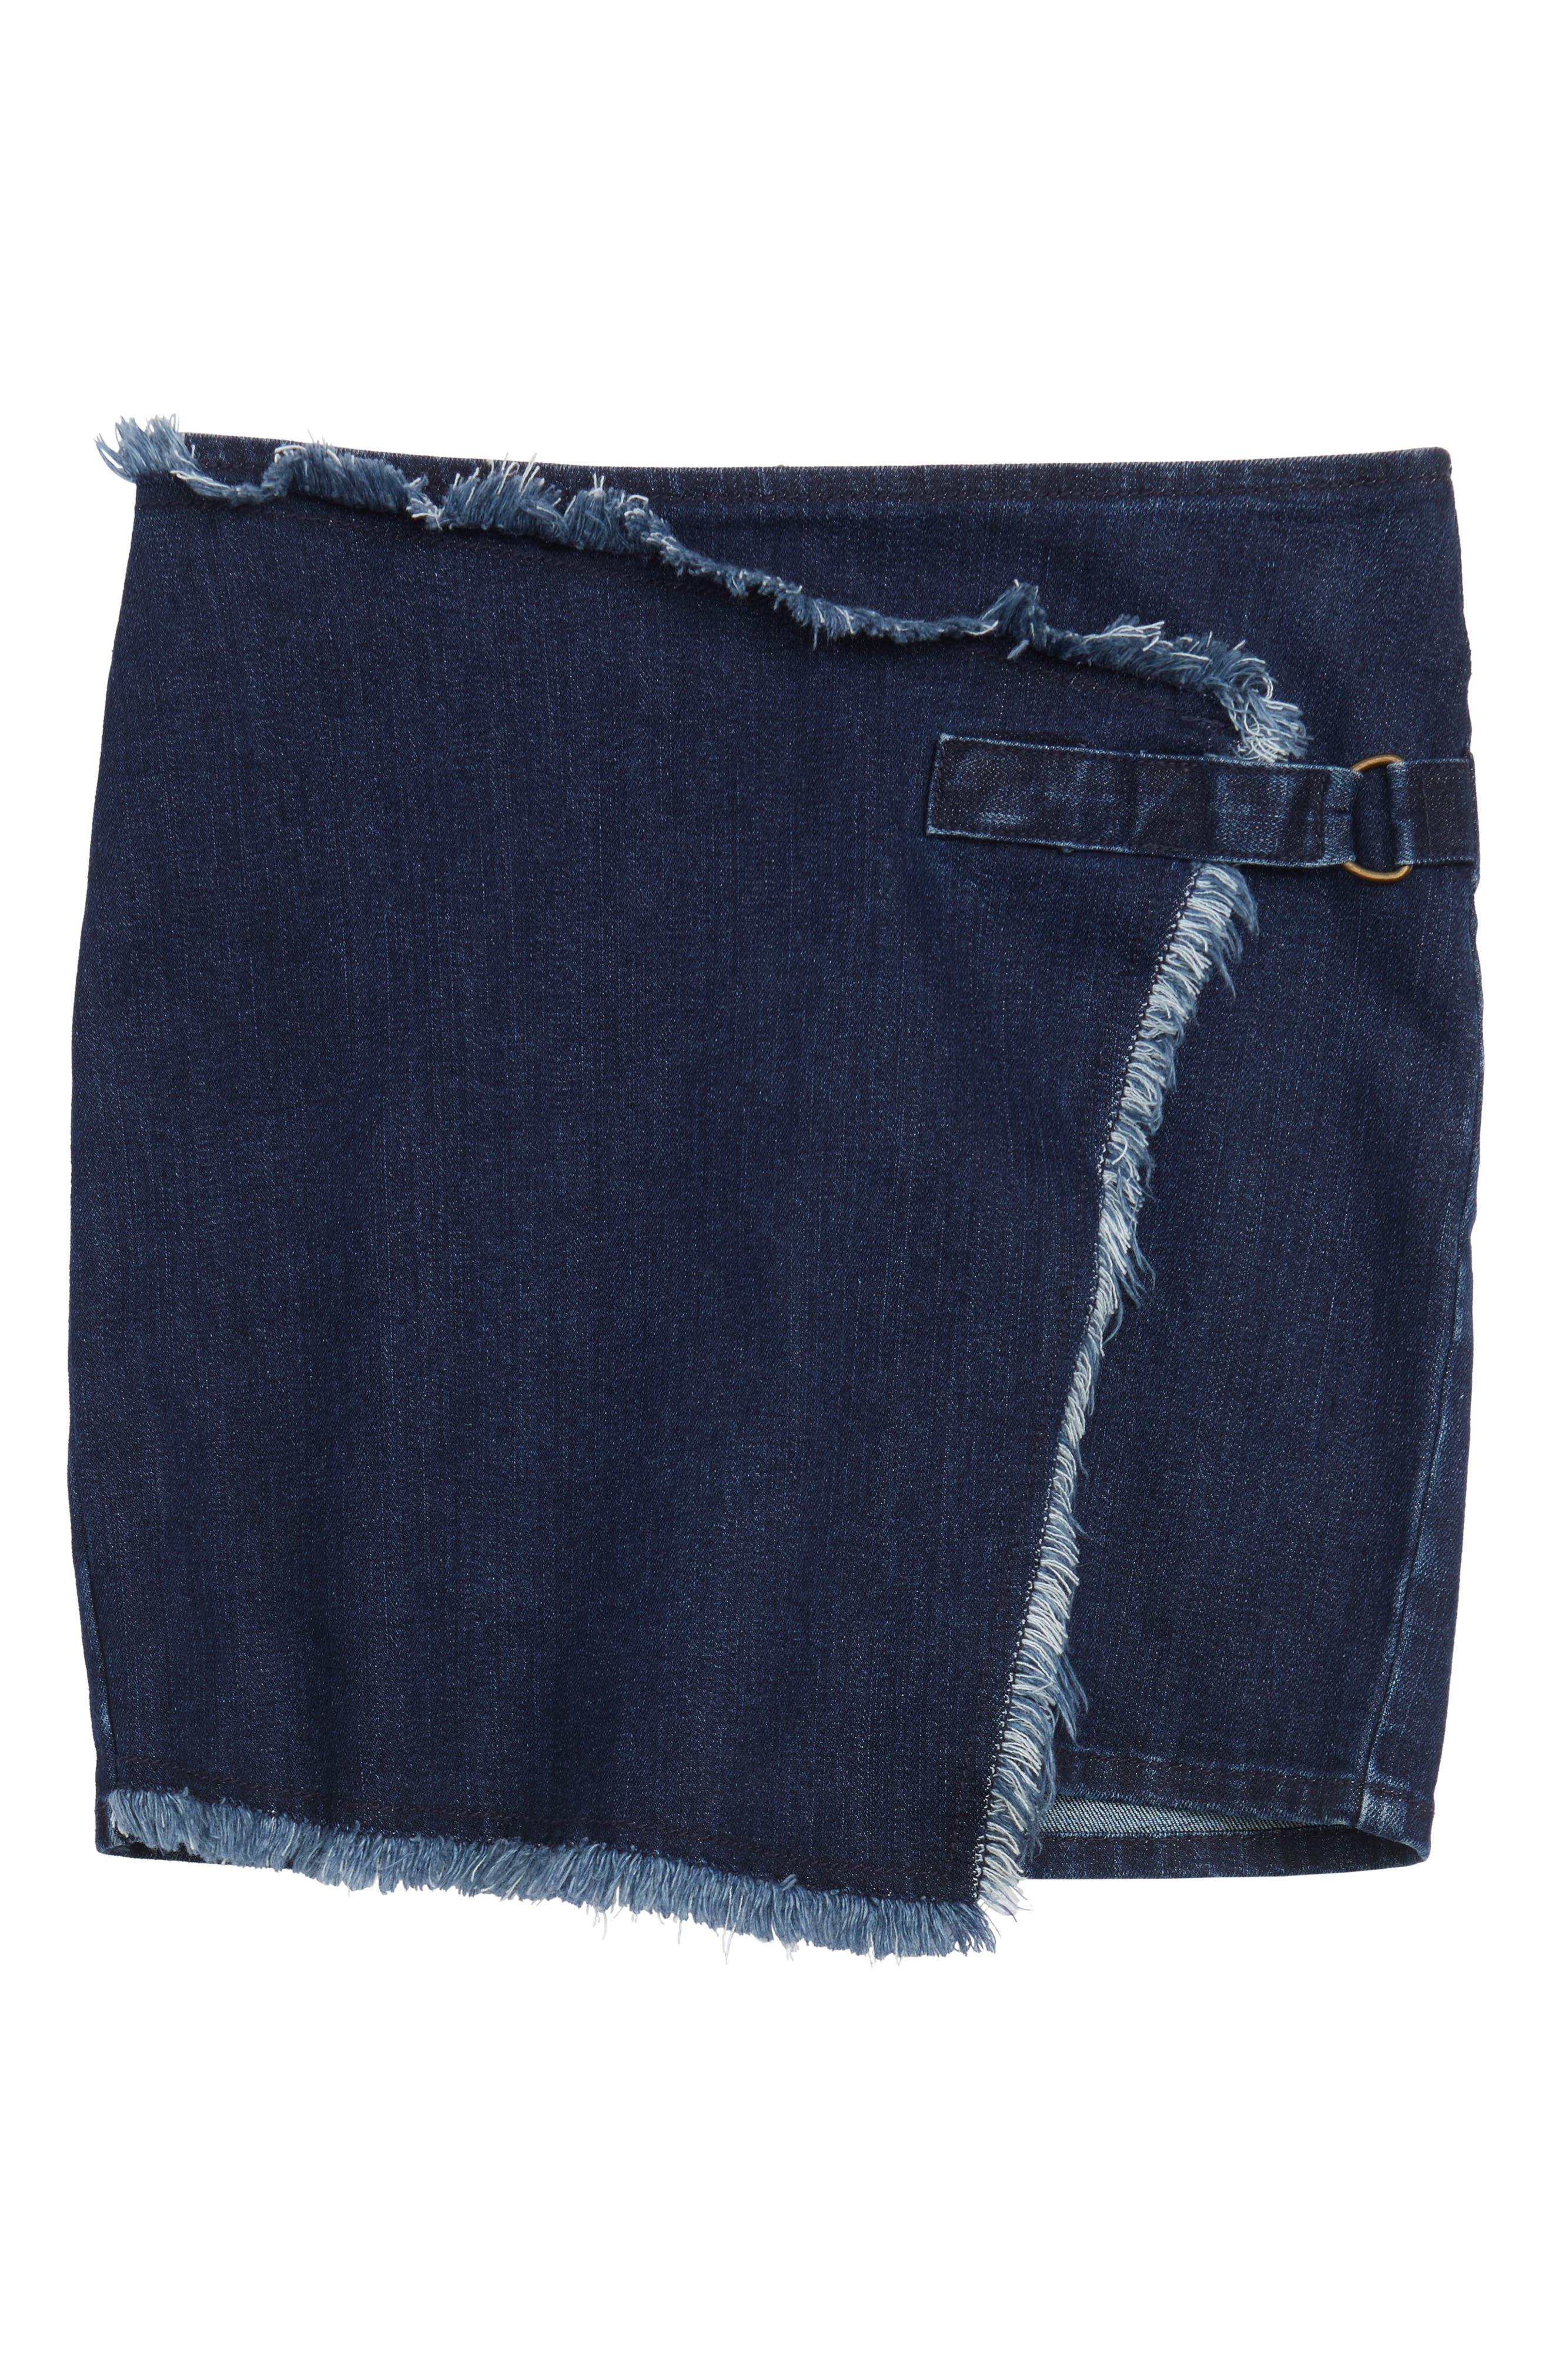 Asymmetrical Wrap Denim Skirt,                         Main,                         color, Sea Blue Wash